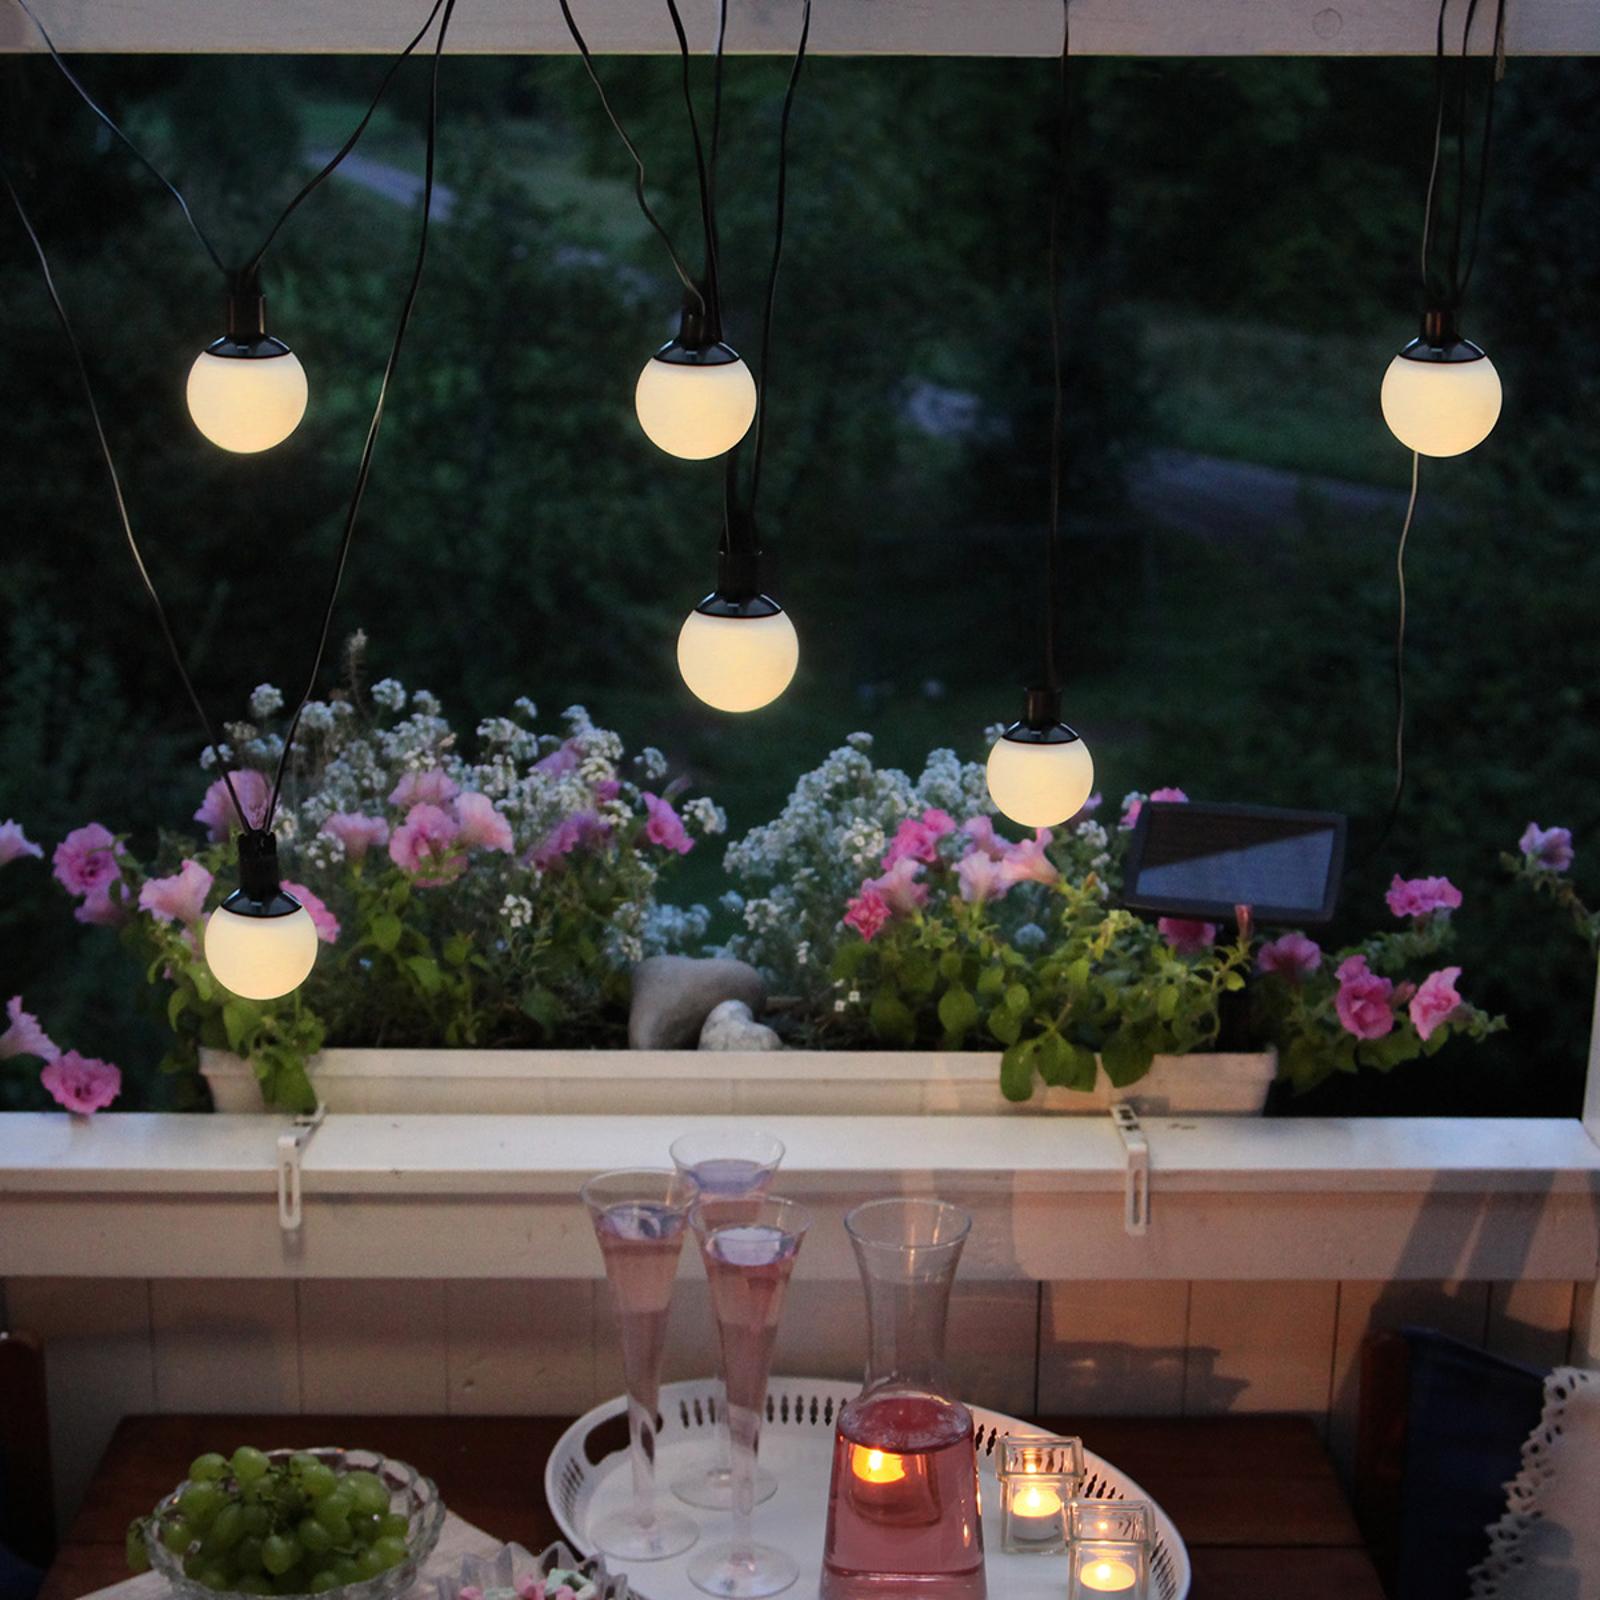 Catena luminosa solare LED con 2 globi solari